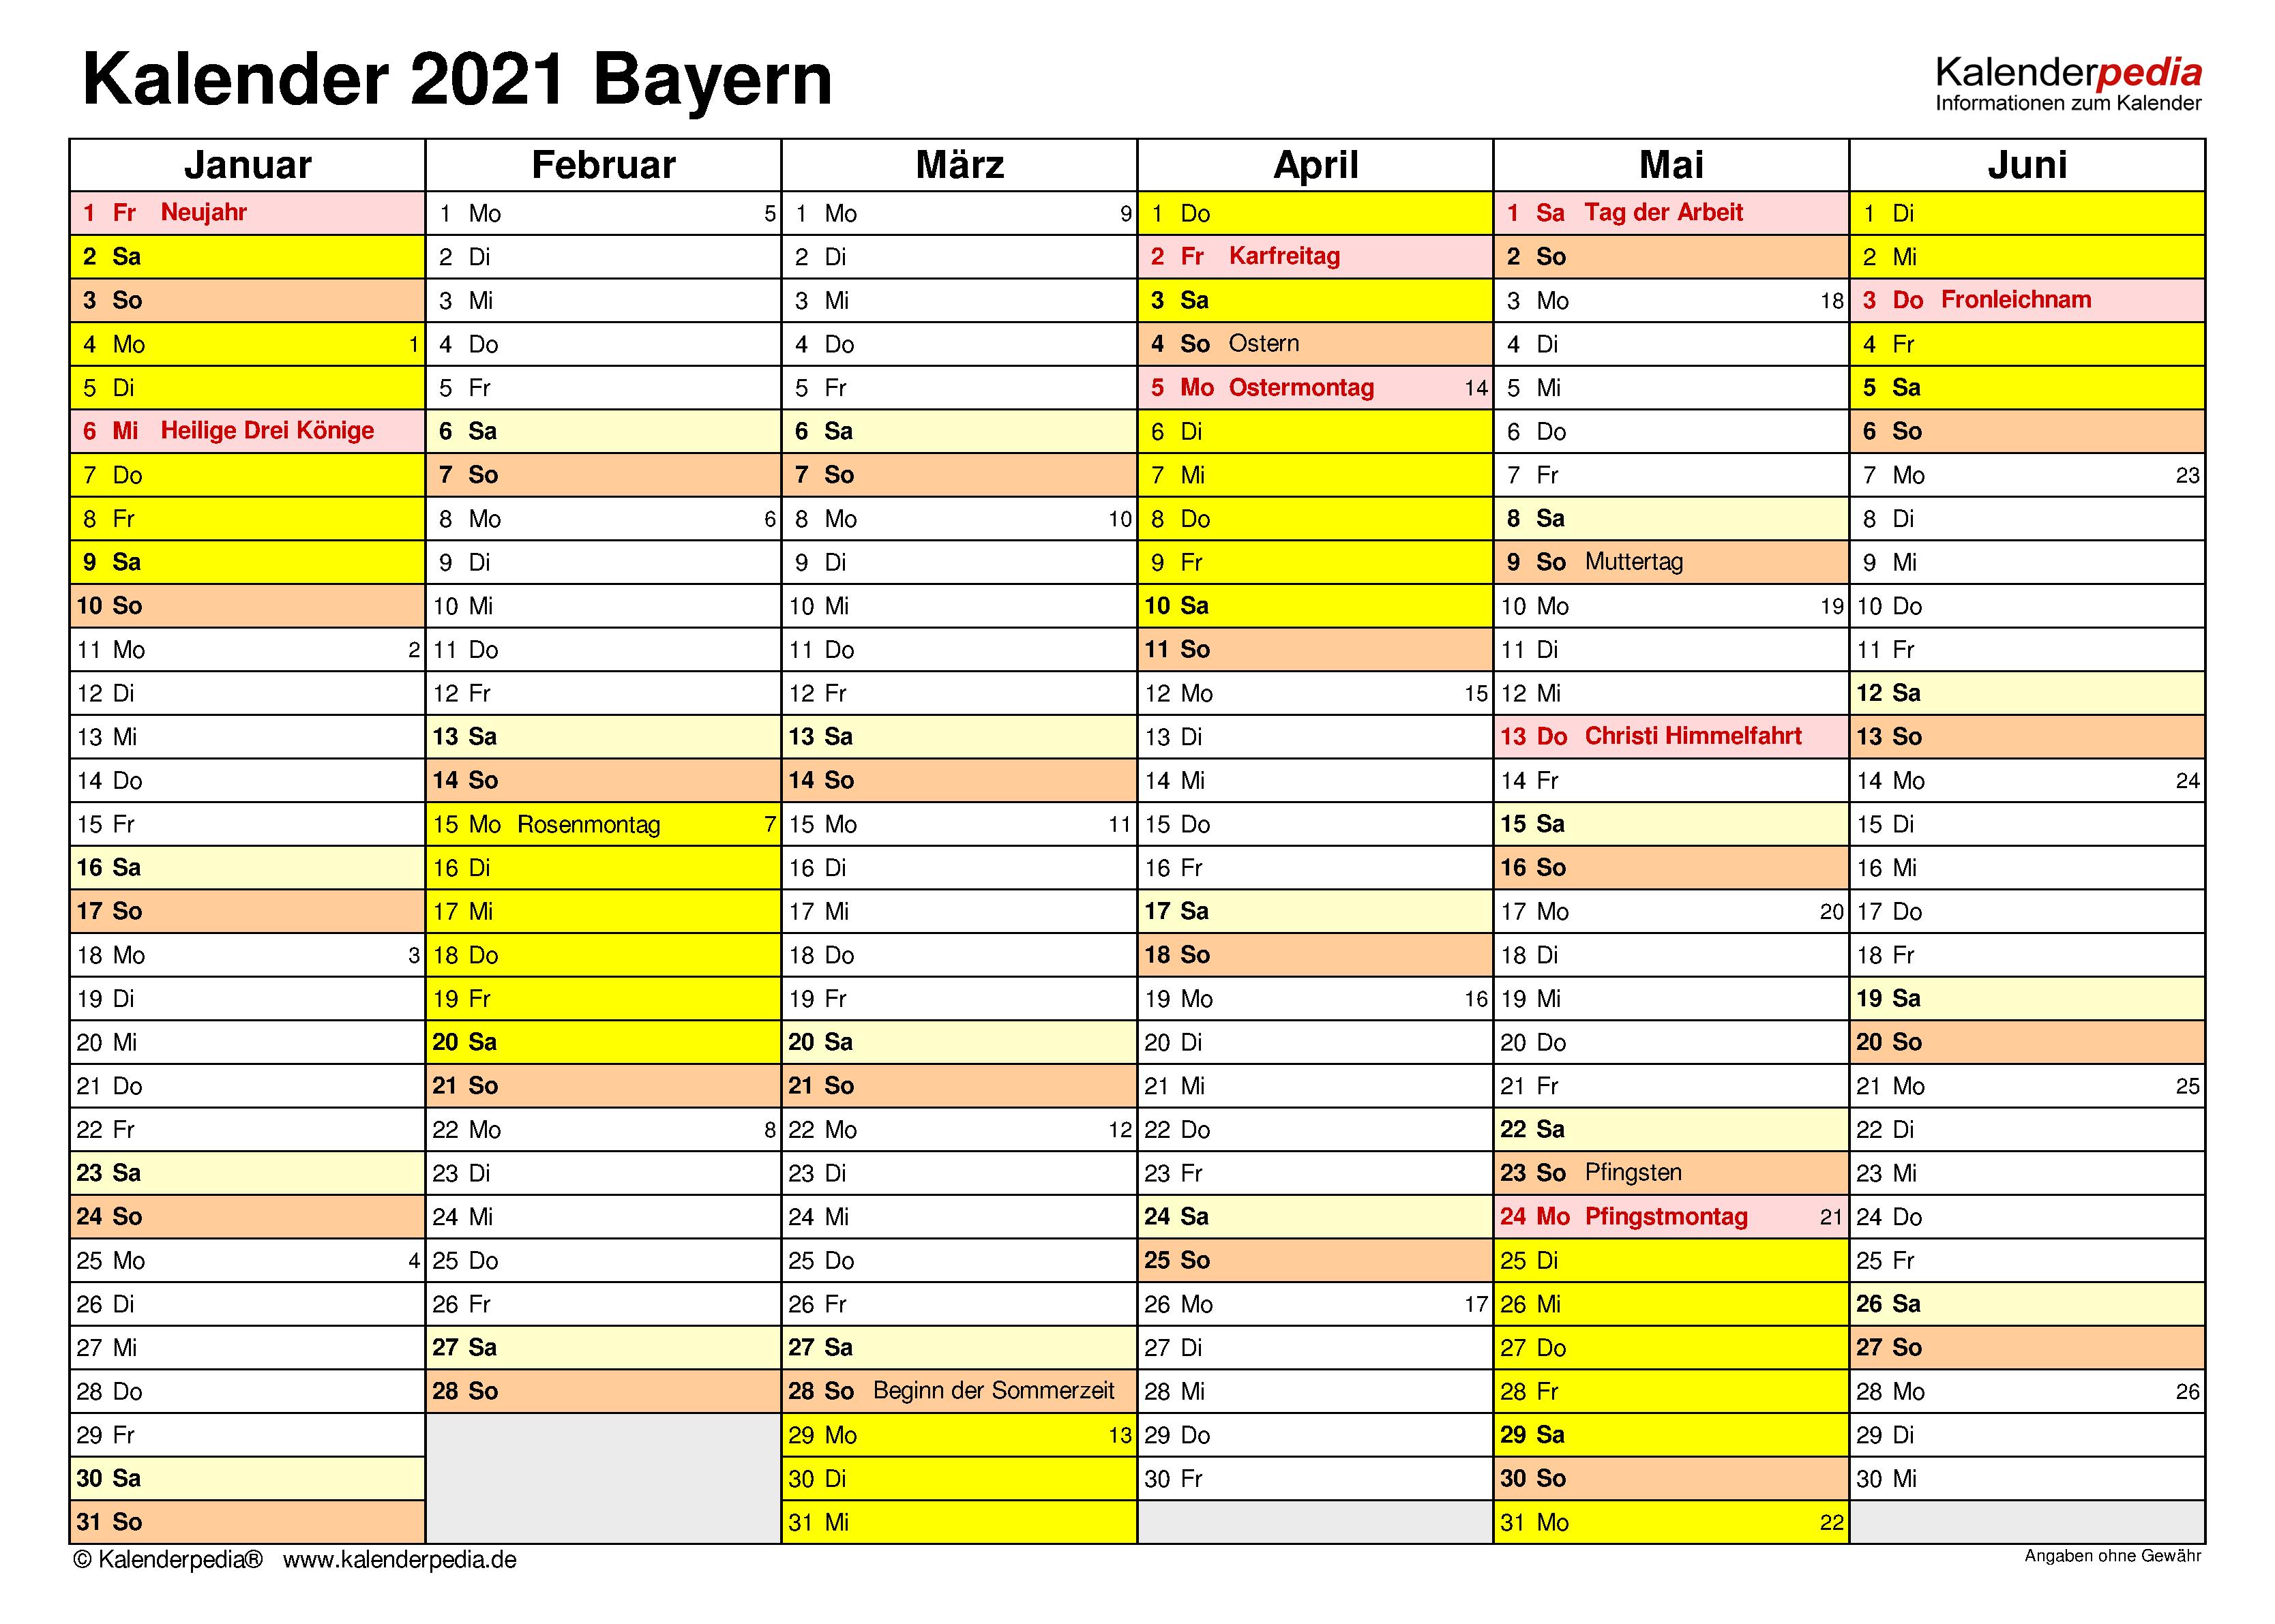 Bayern Kalender 2021